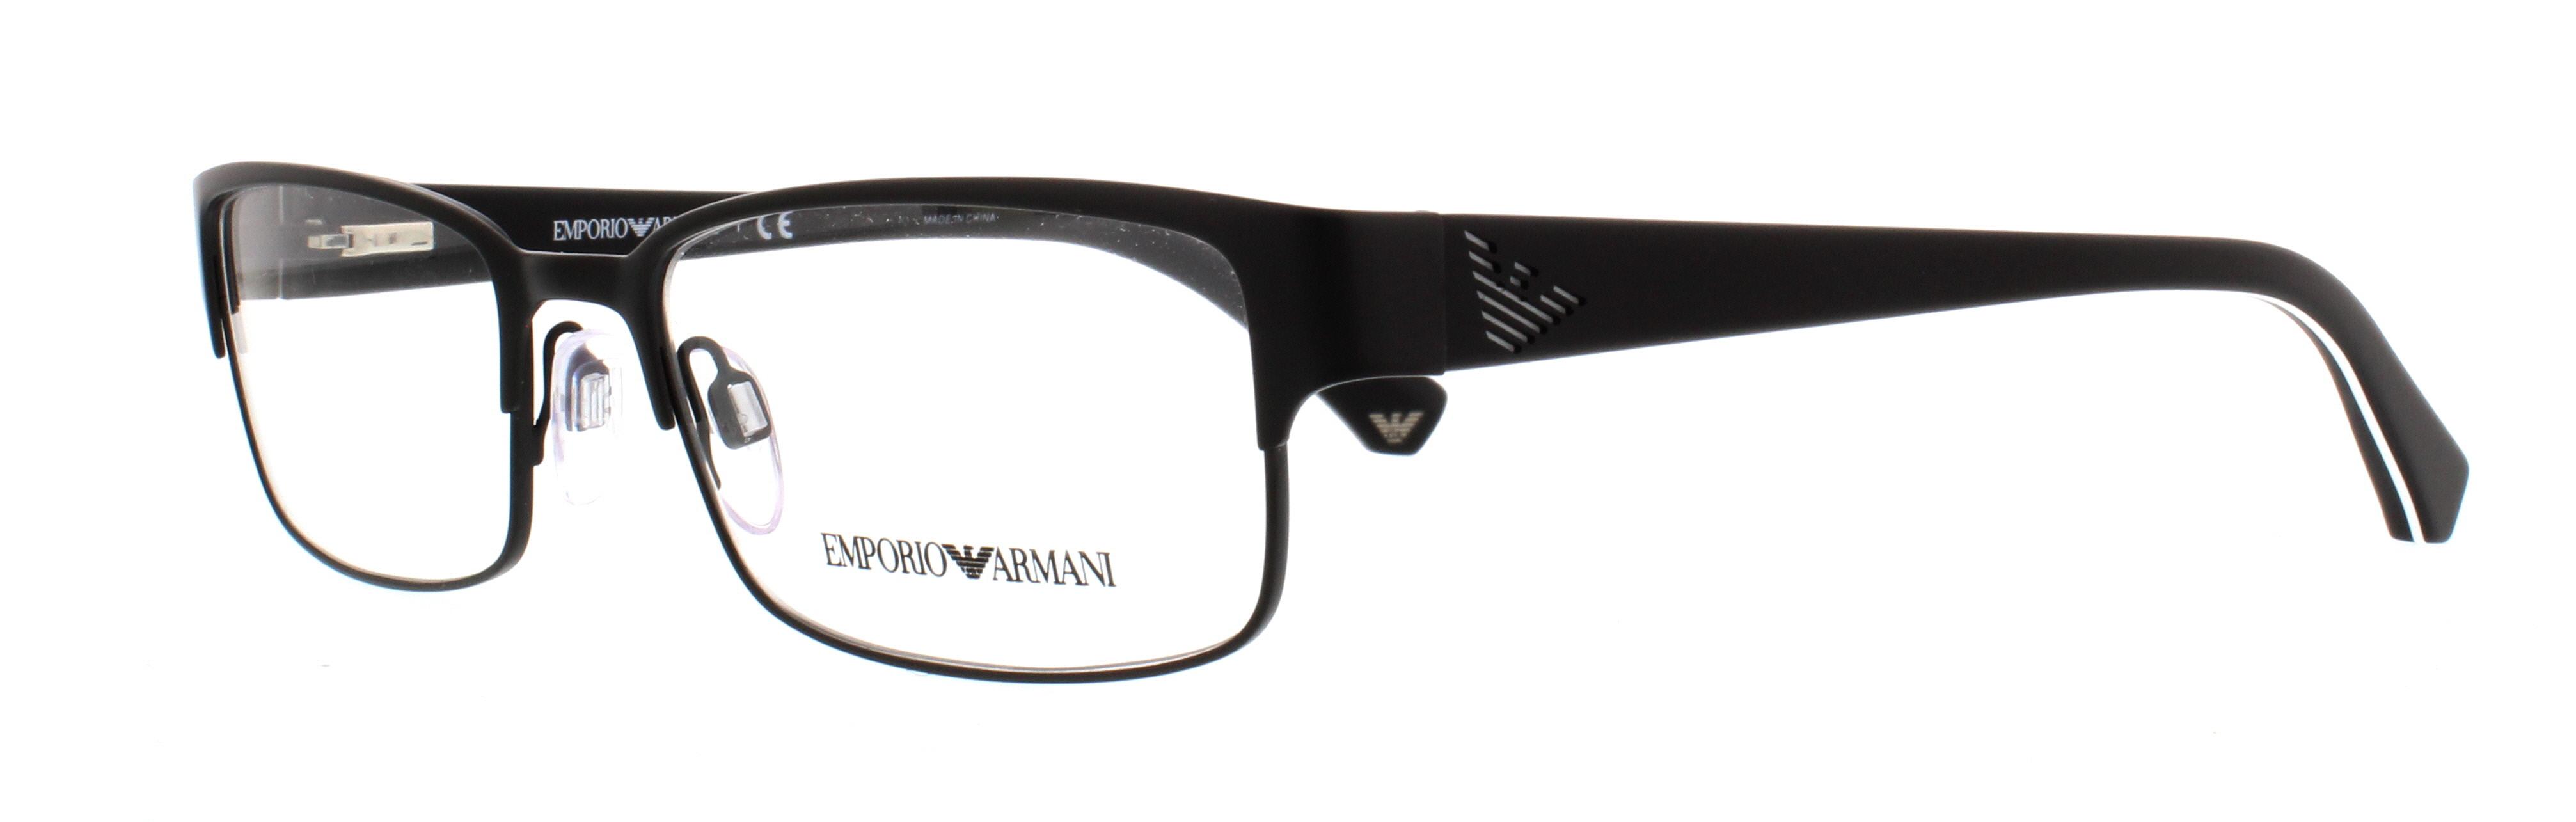 bf8568de3c EMPORIO ARMANI Eyeglasses EA1036 3109 Matte Black 53MM 8053672390629 ...